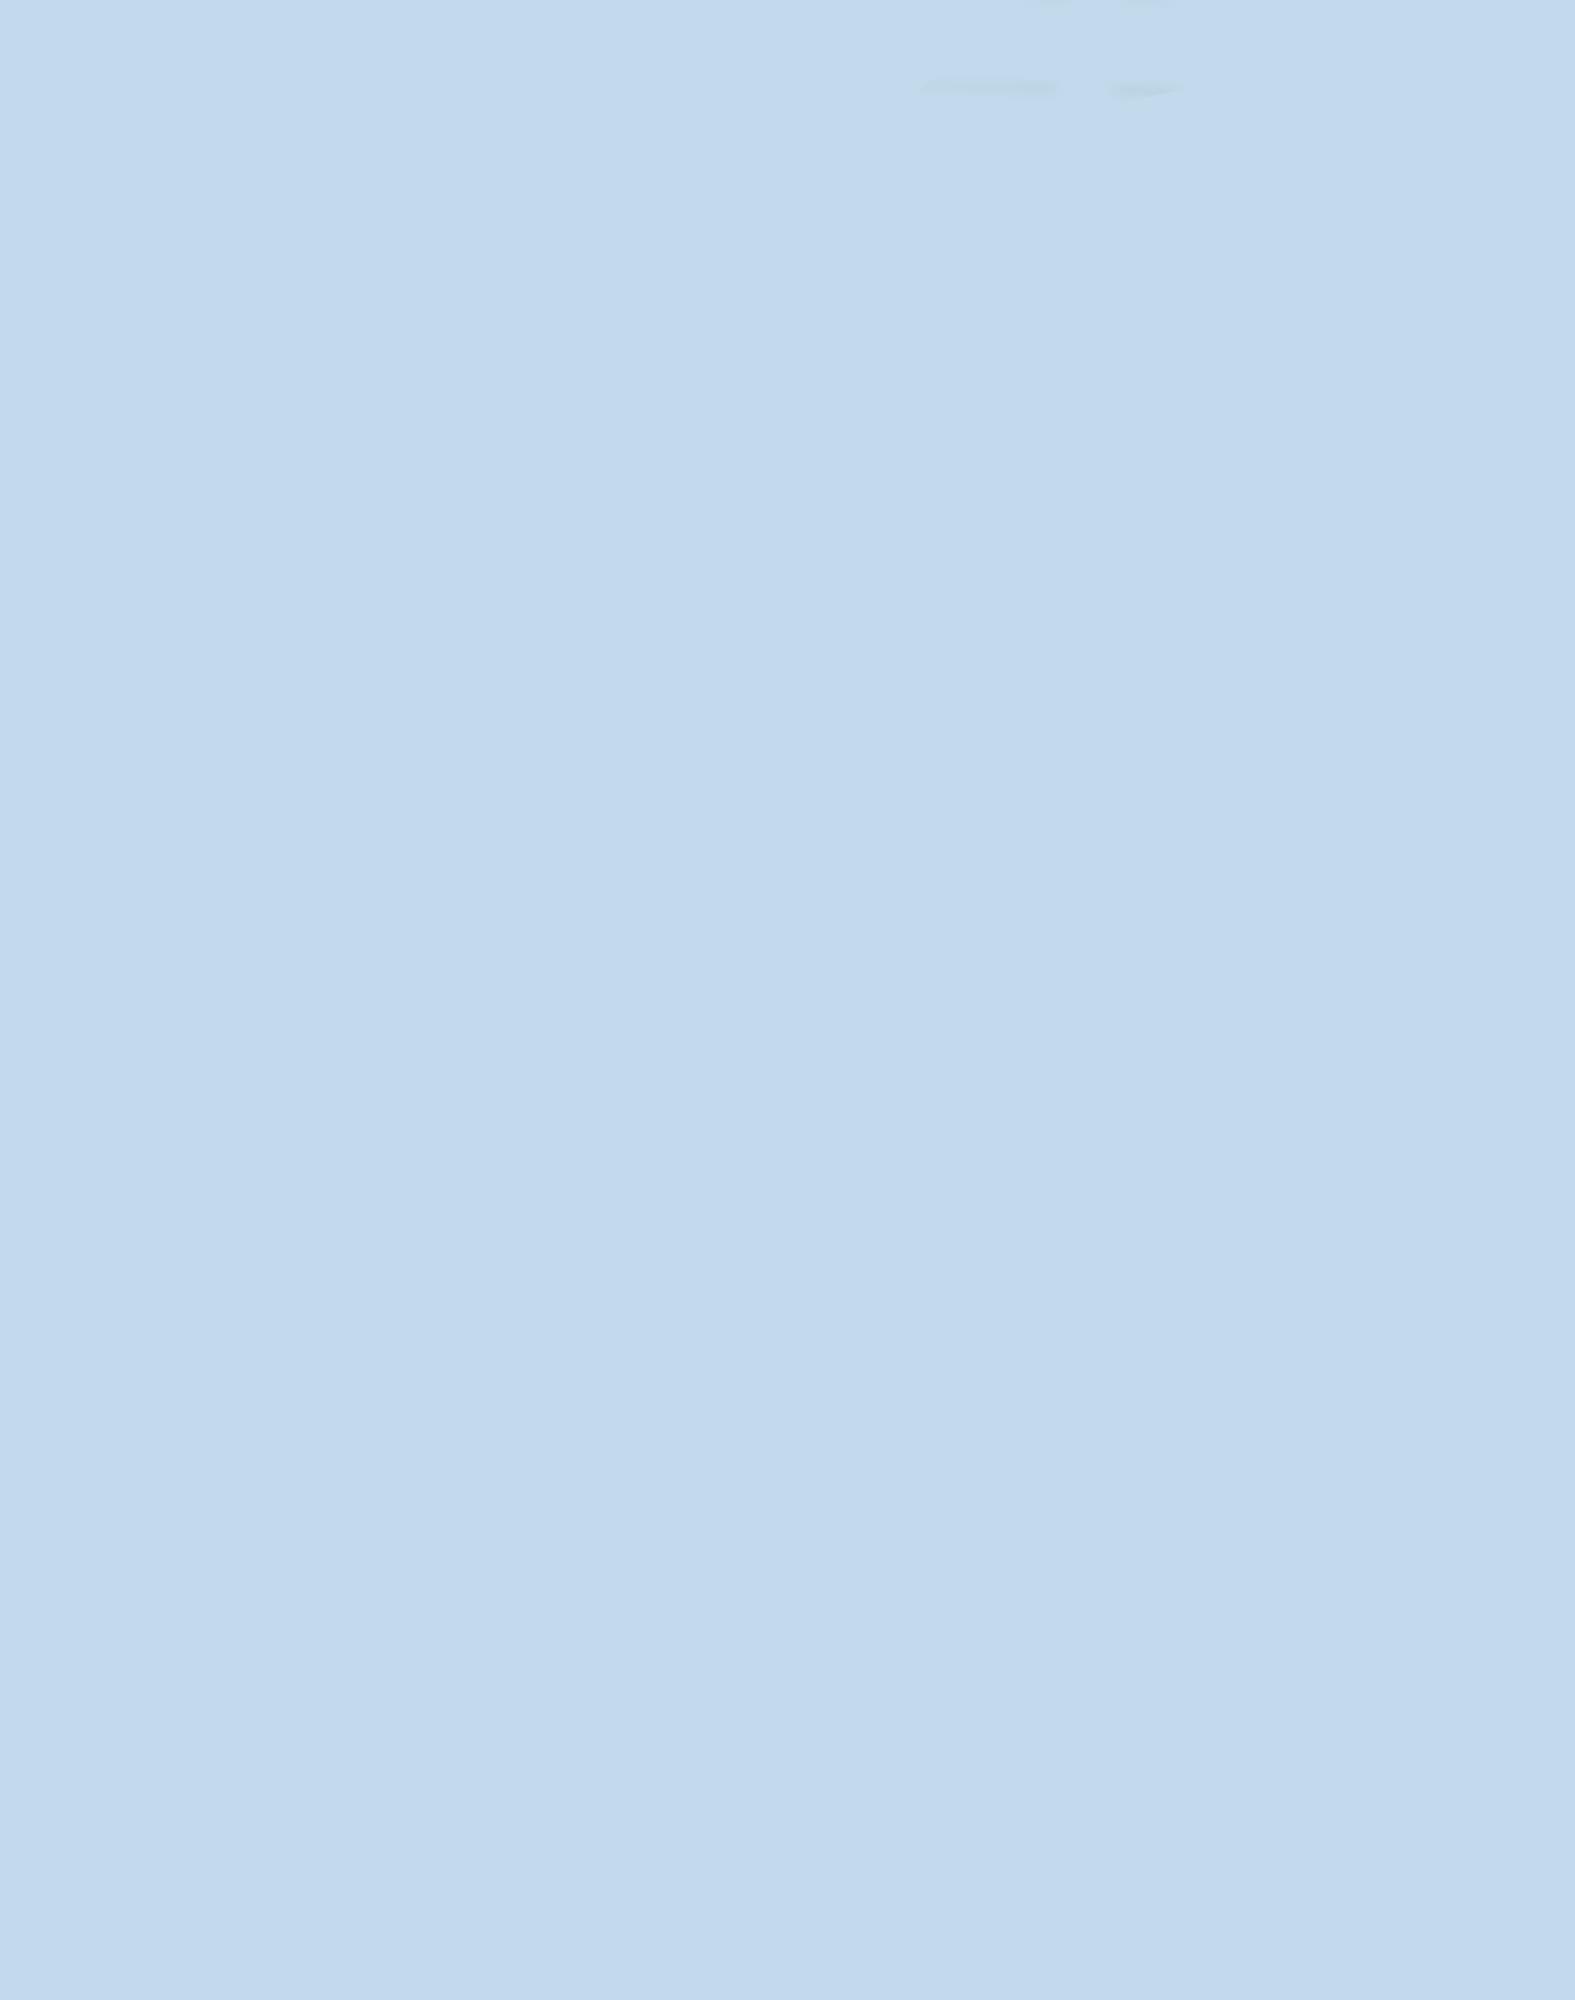 Blue Horizon 194,218,235